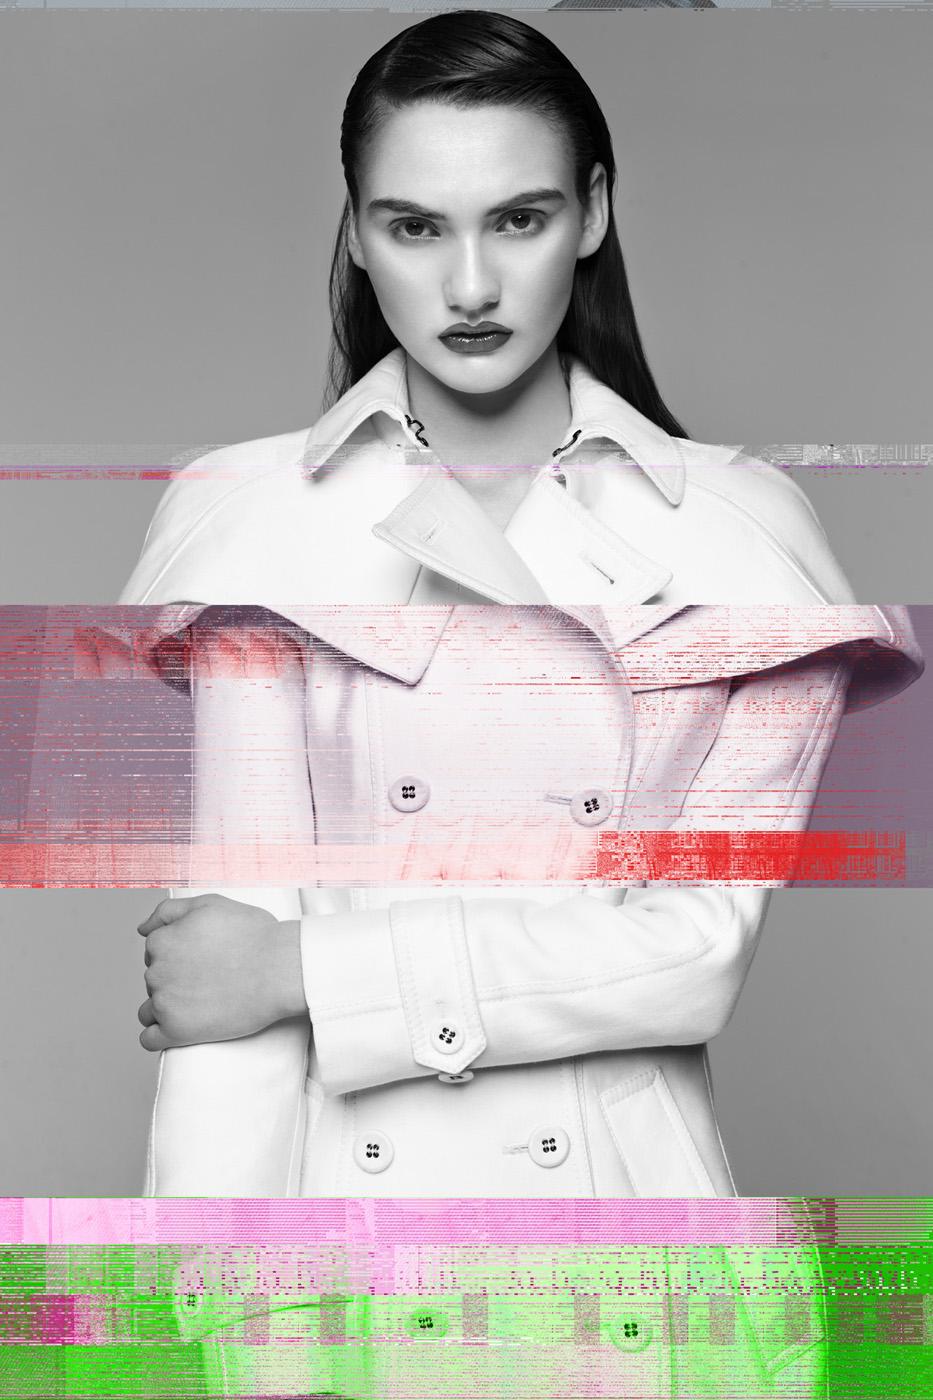 Natalia Bieganska by Lukasz Zietek for CHASSEUR MAGAZINE